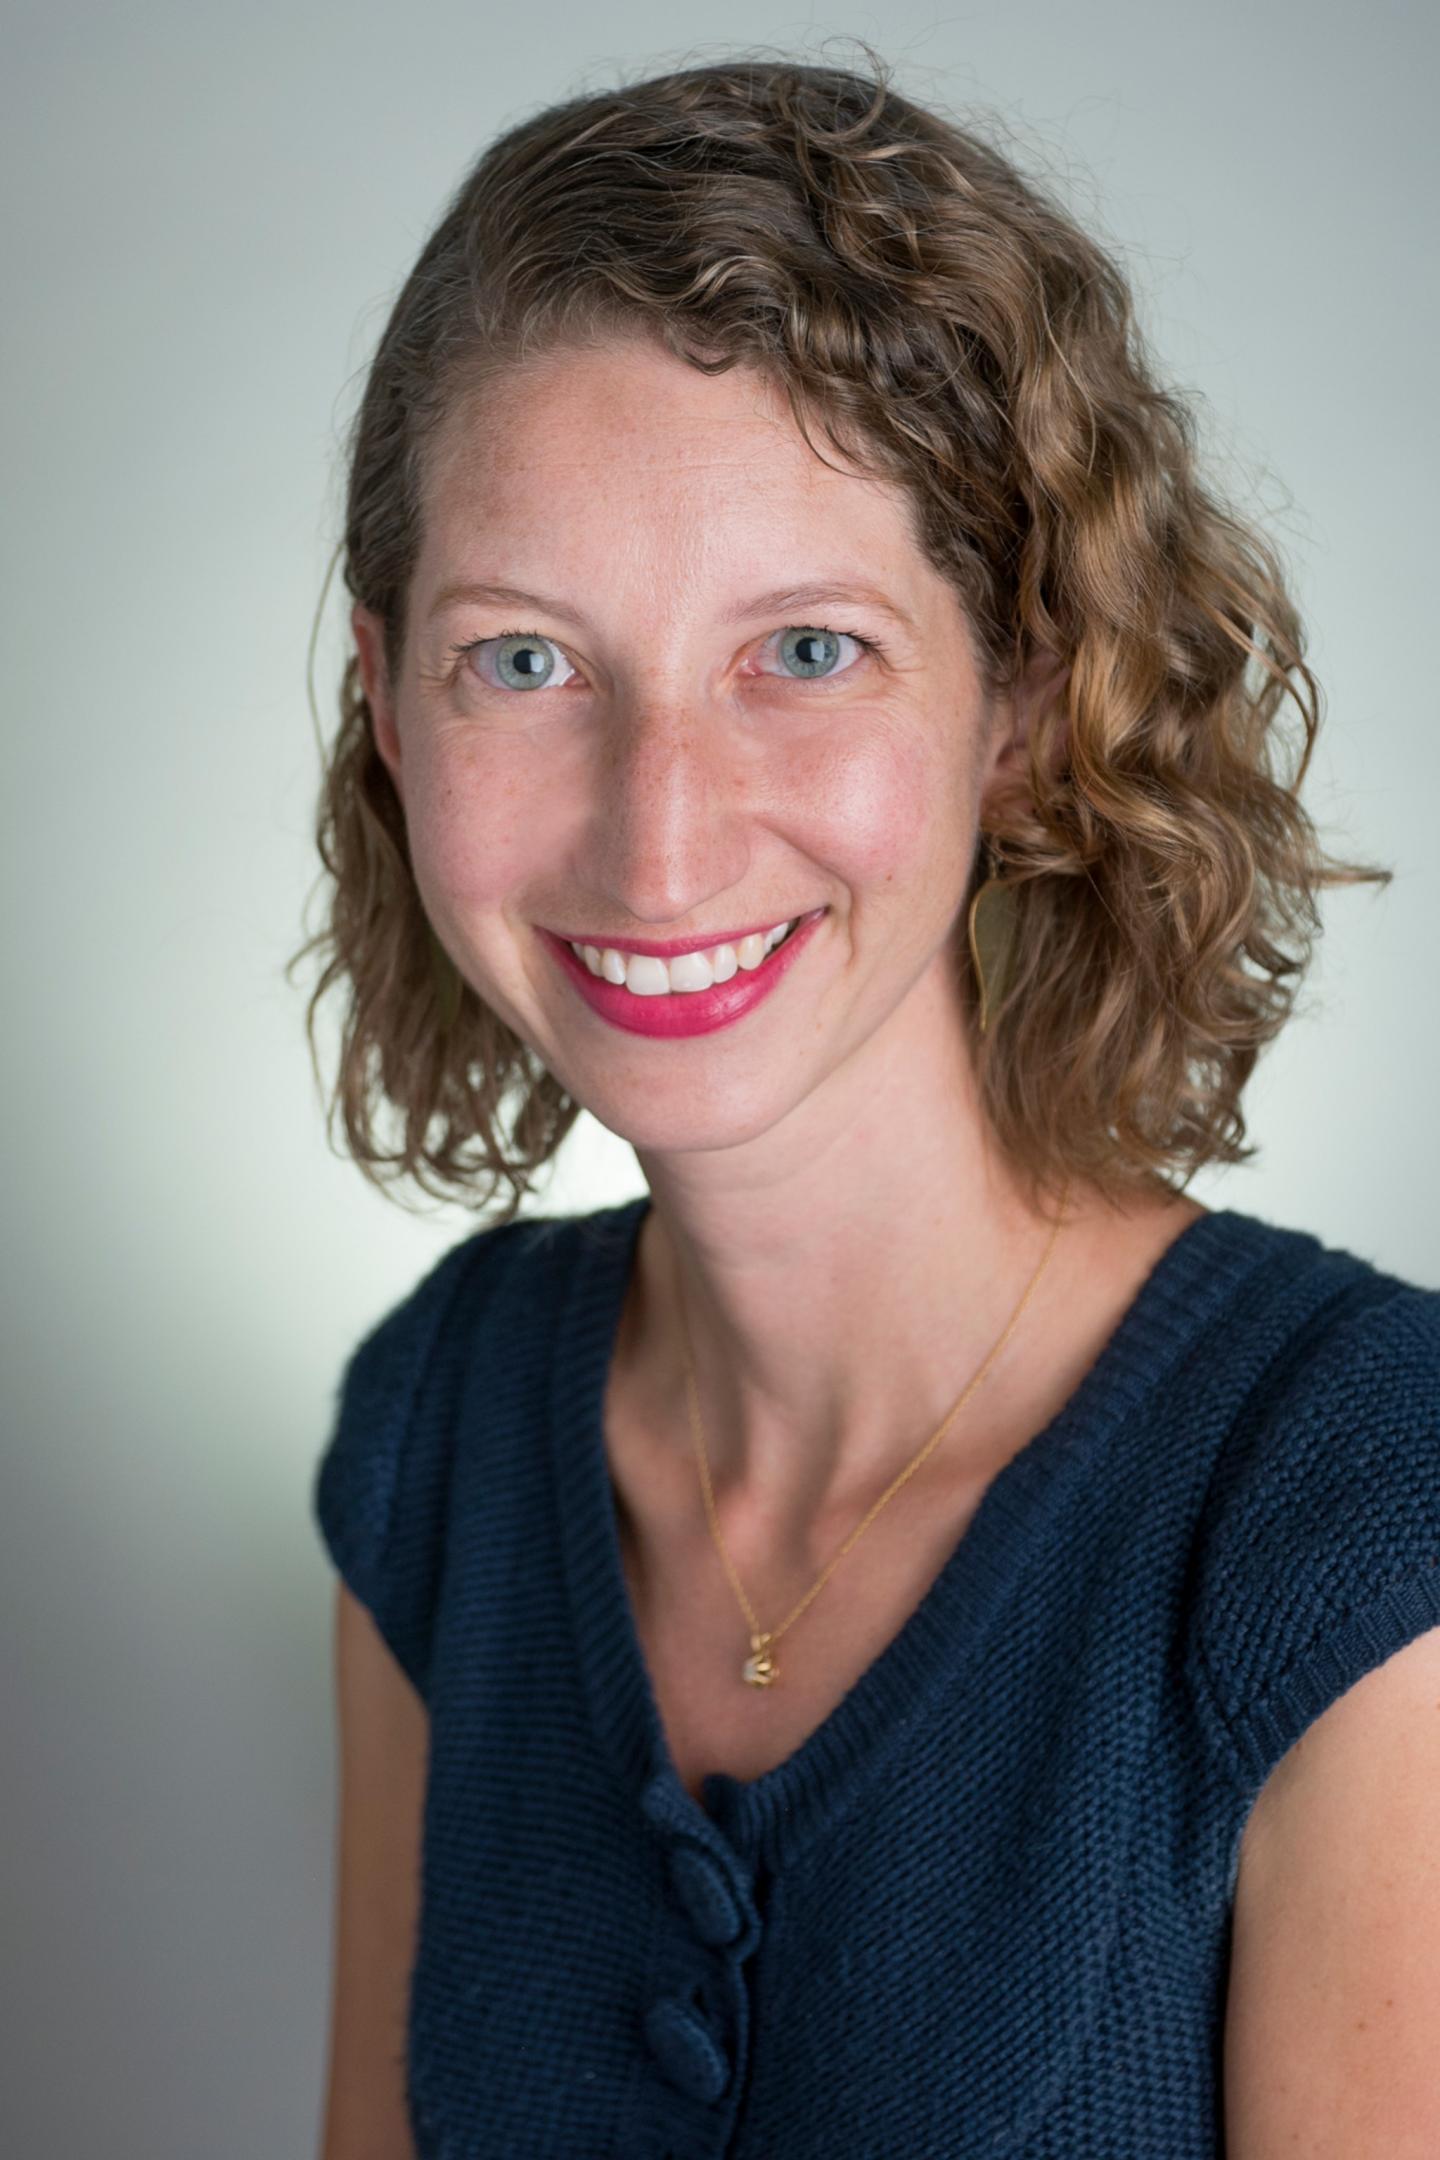 Molly Rosenberg, Indiana University